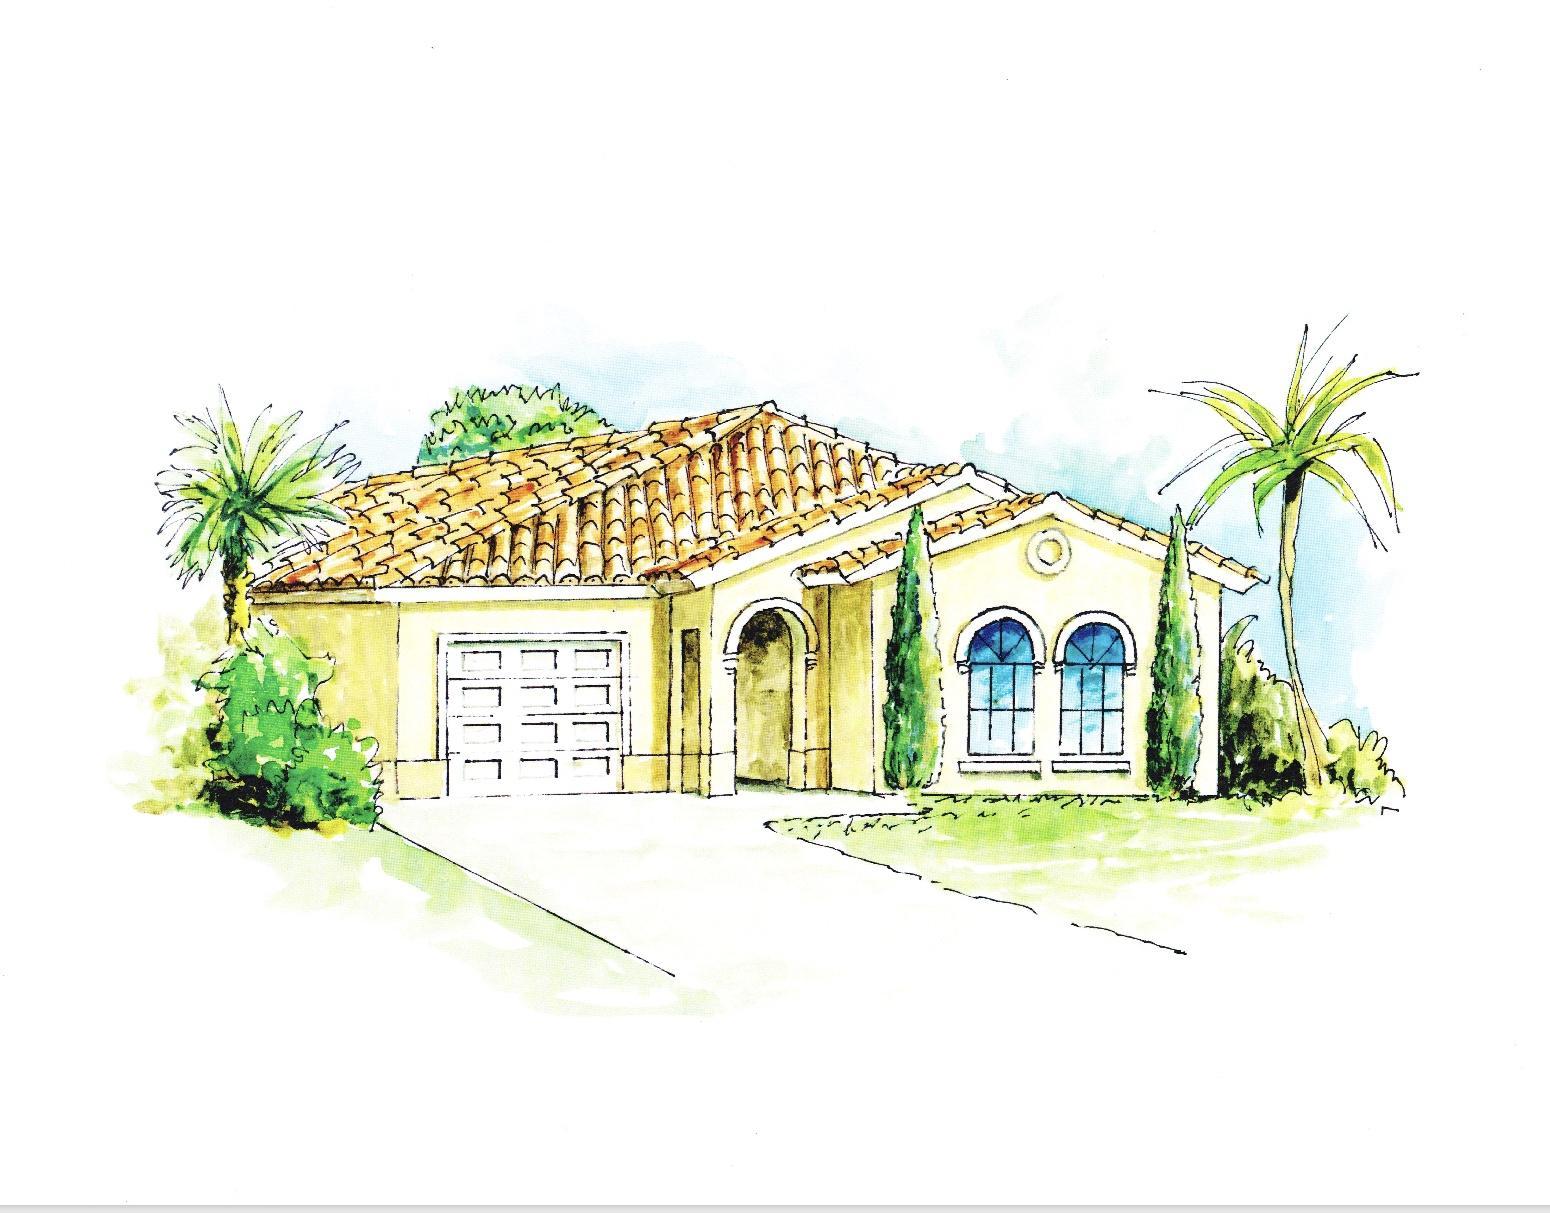 812 Sunset Road West Palm Beach, FL 33401